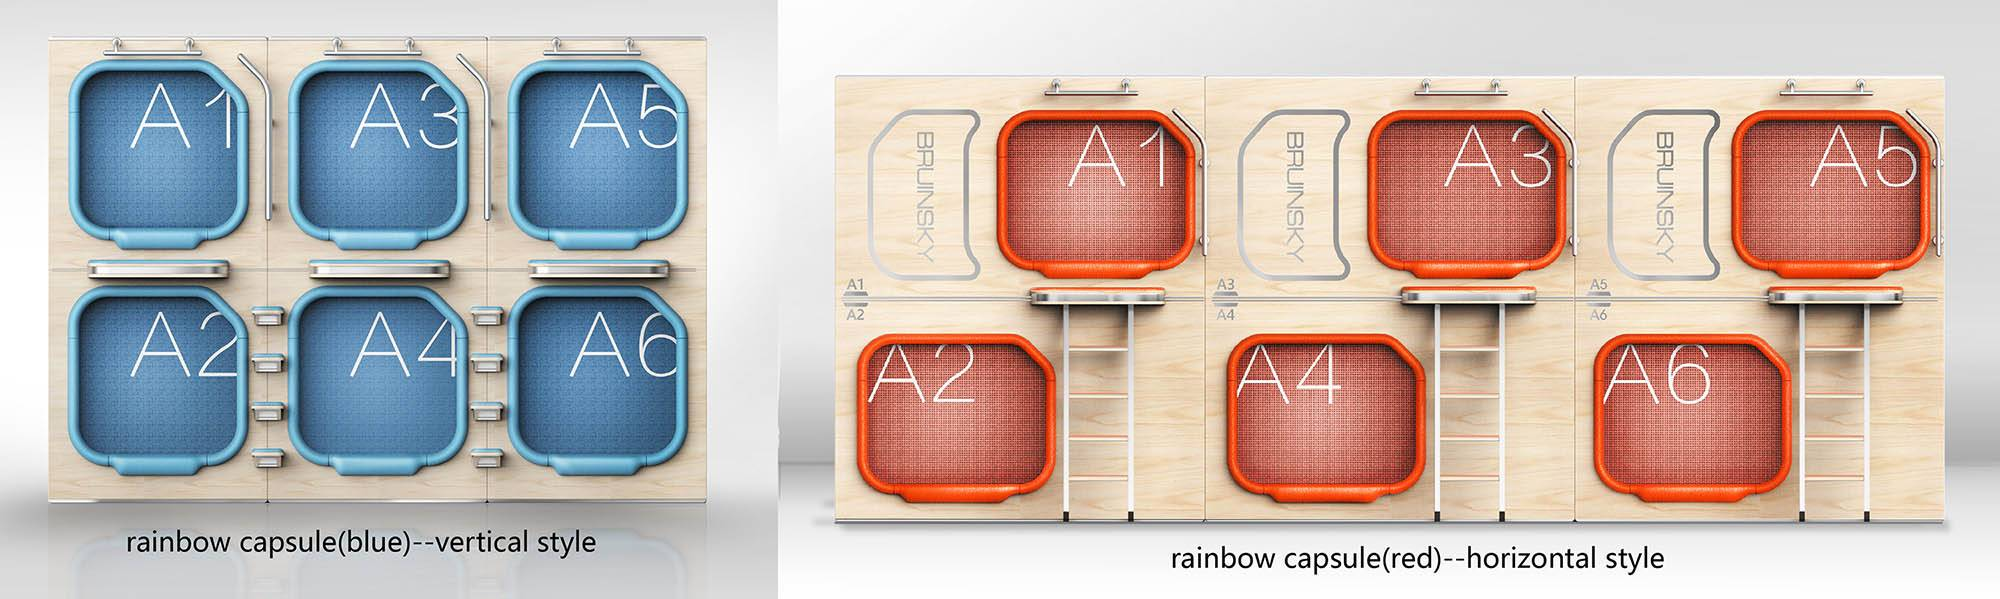 rainbow capsule